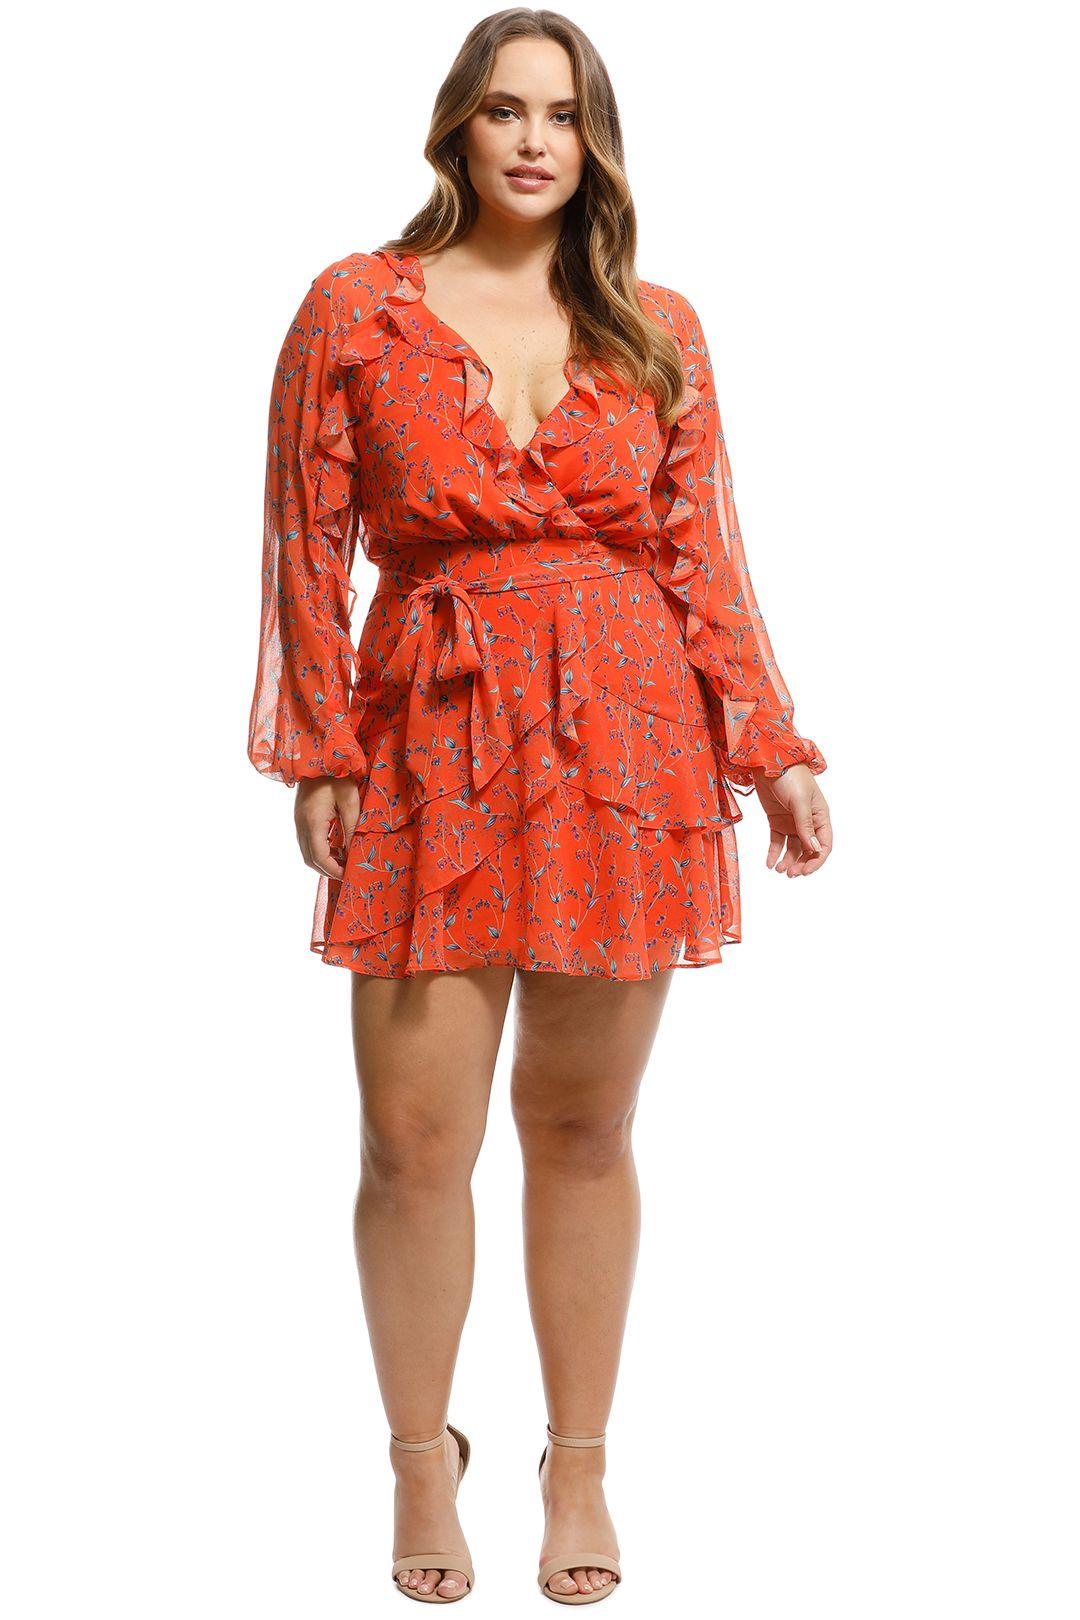 Talulah - Daring Day LS Mini Dress - Orange - Front